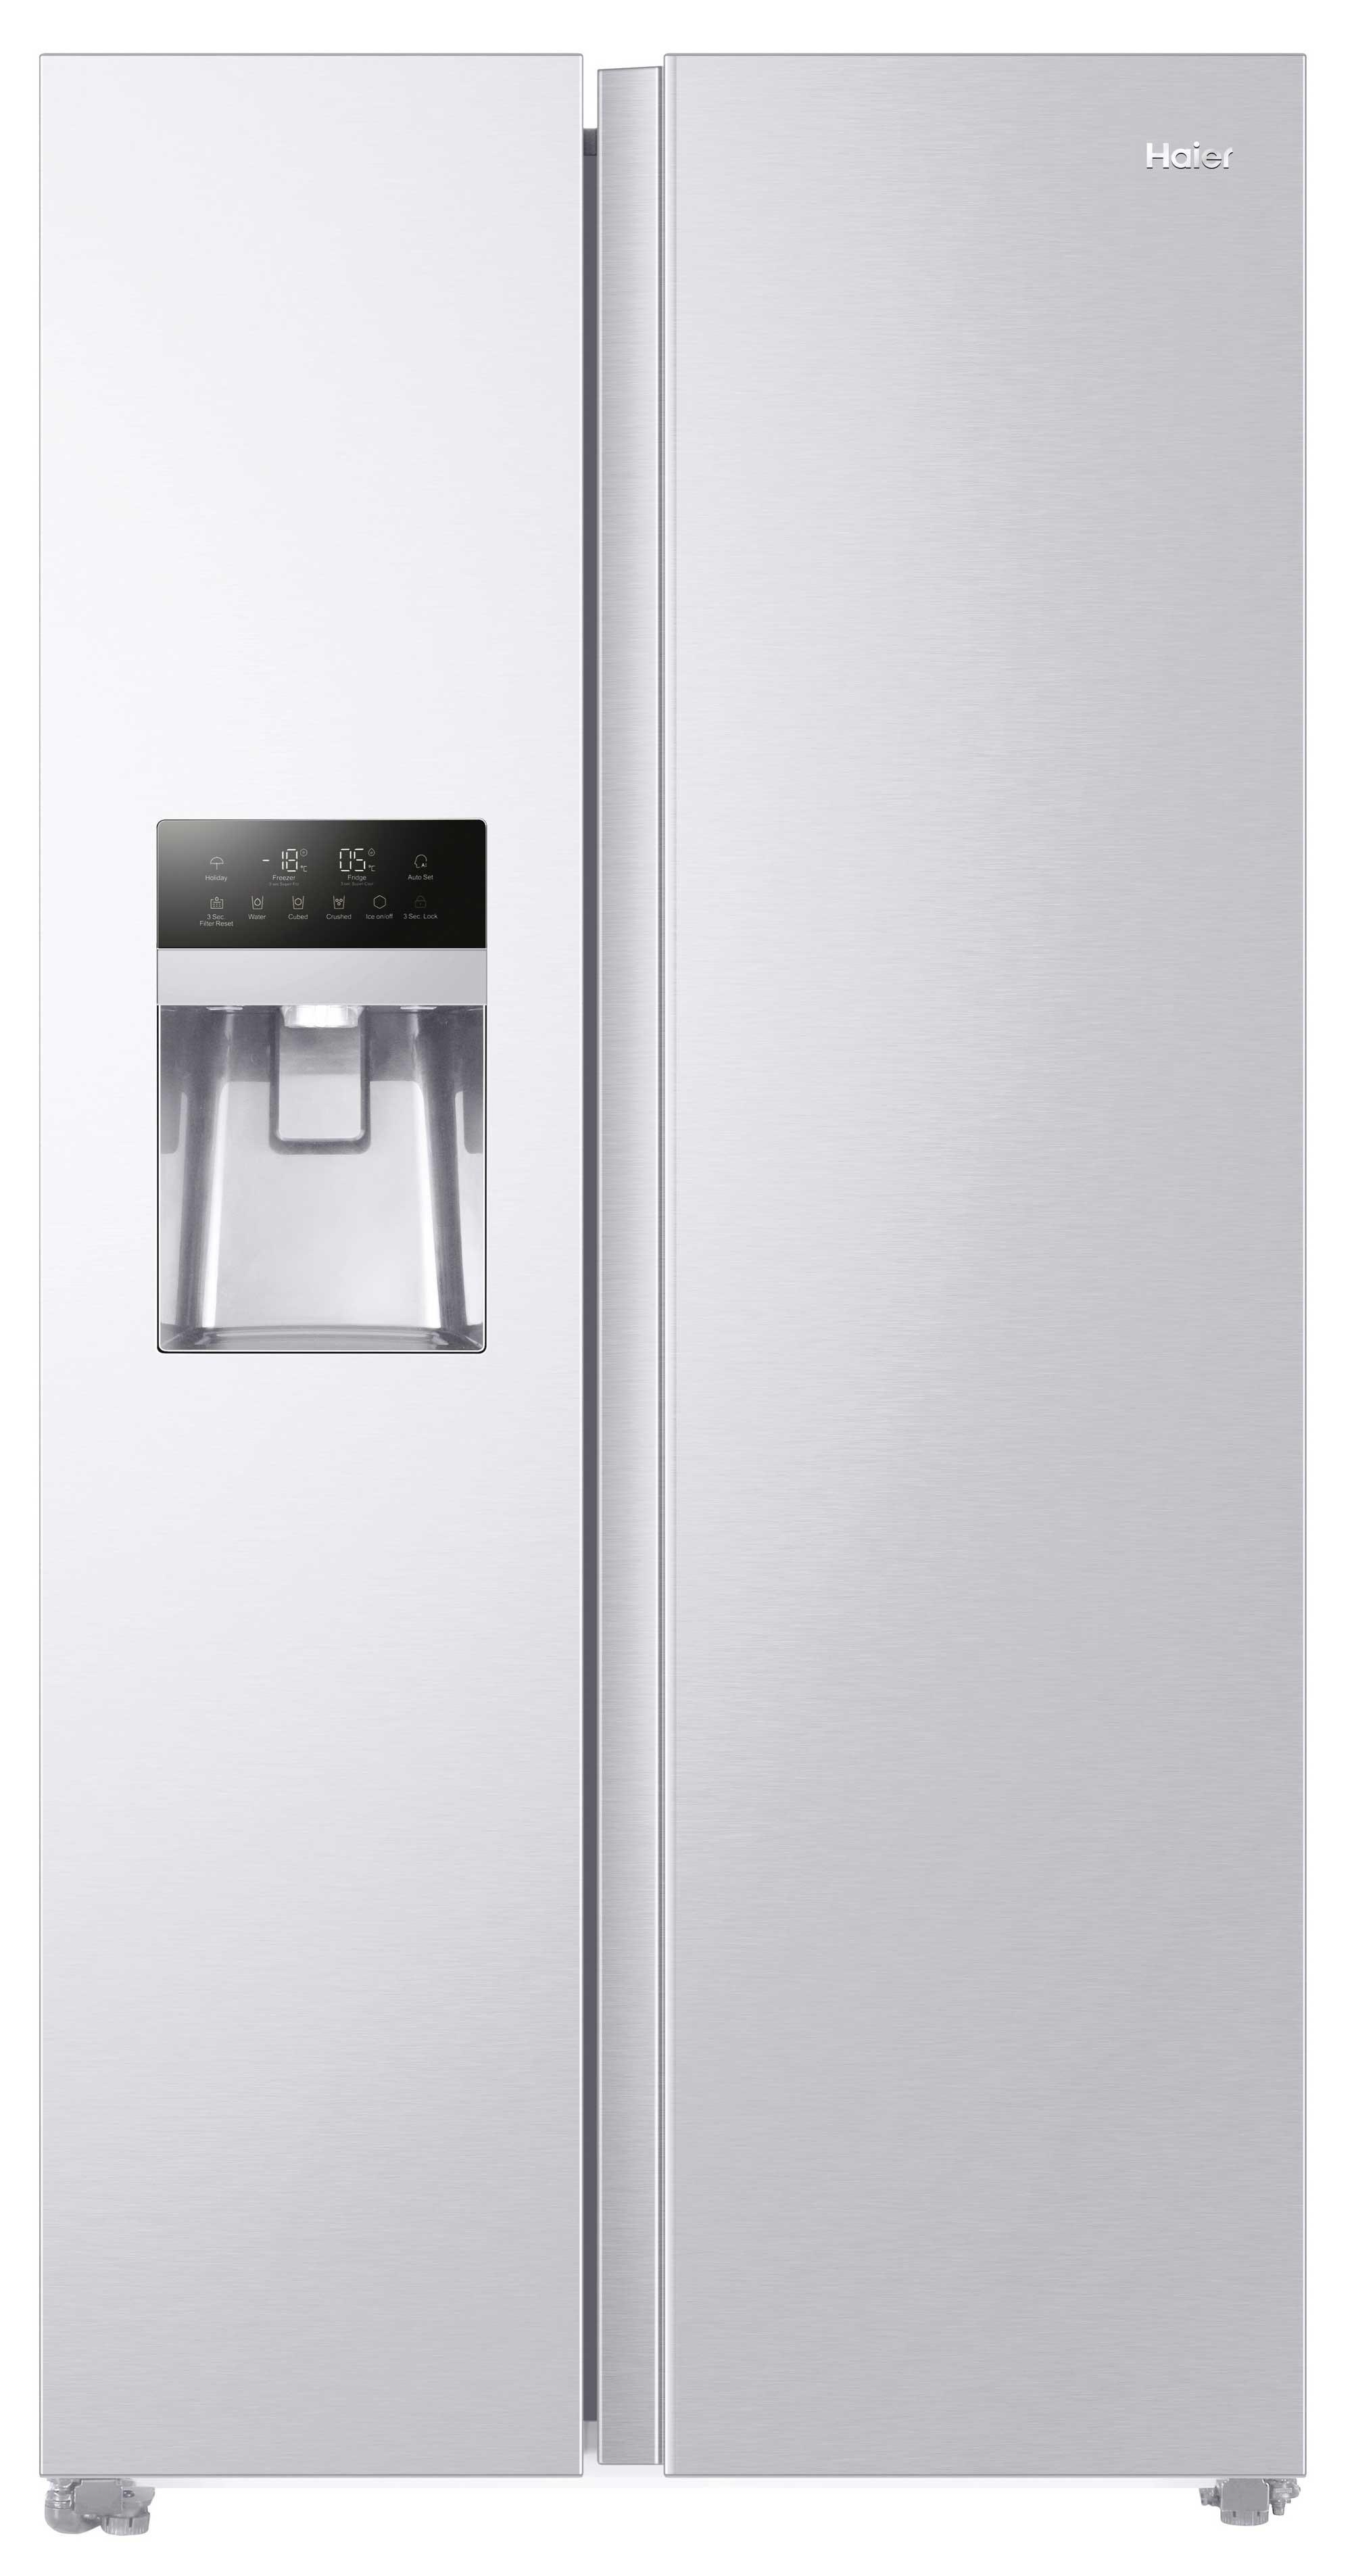 Photo Réfrigérateur Américain  Haier HSR3918FIPW